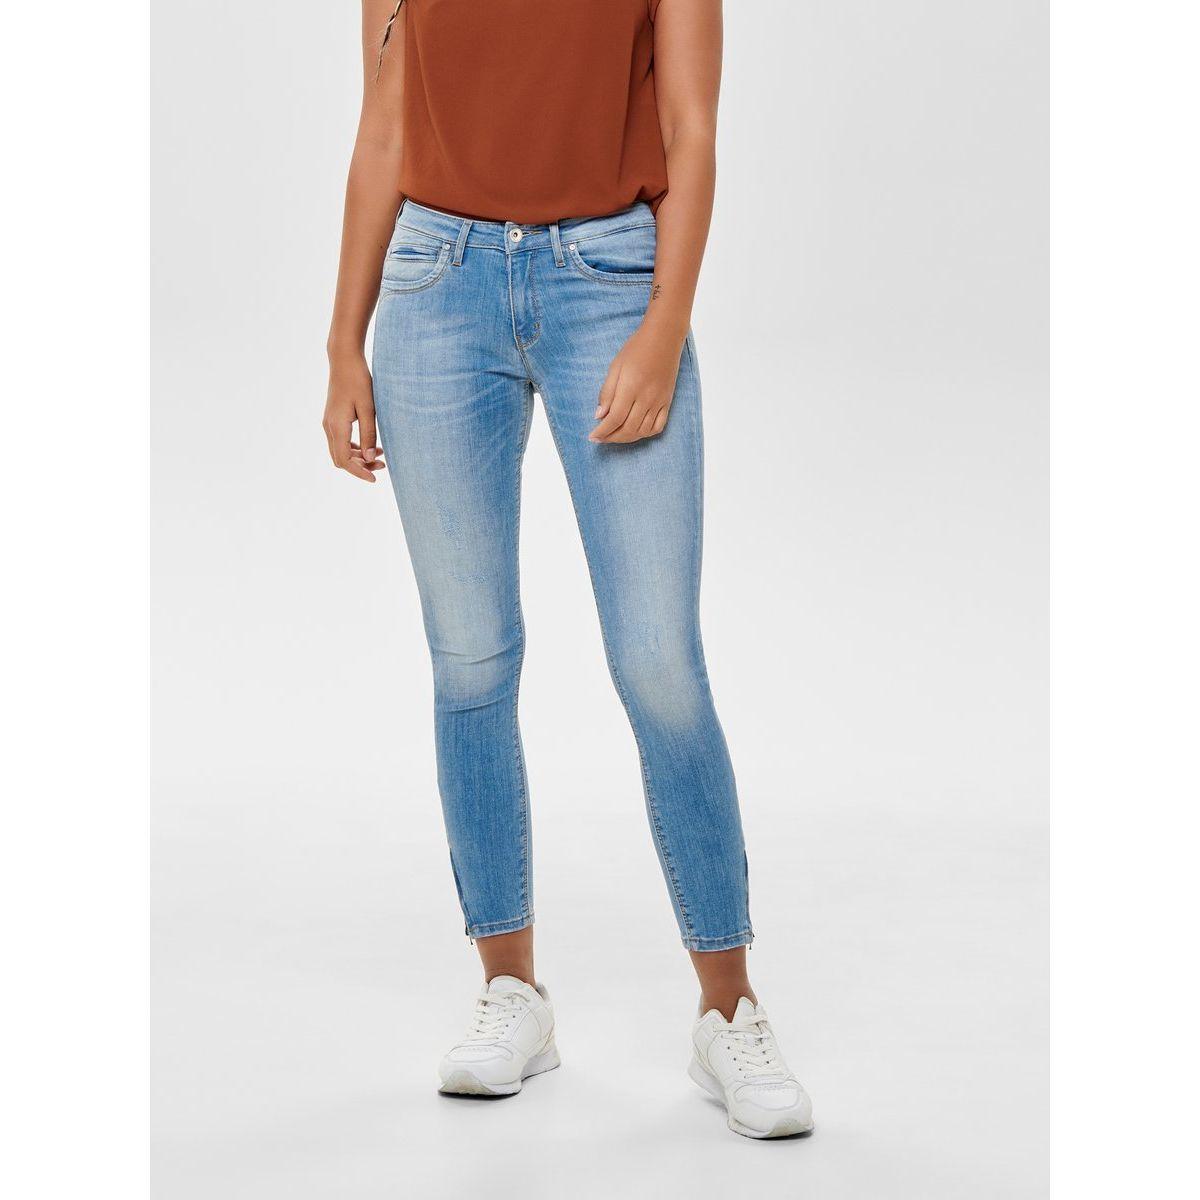 oodji Ultra Femme Sweat-Shirt en Coton avec Imprim/é et Strass M/étalliques